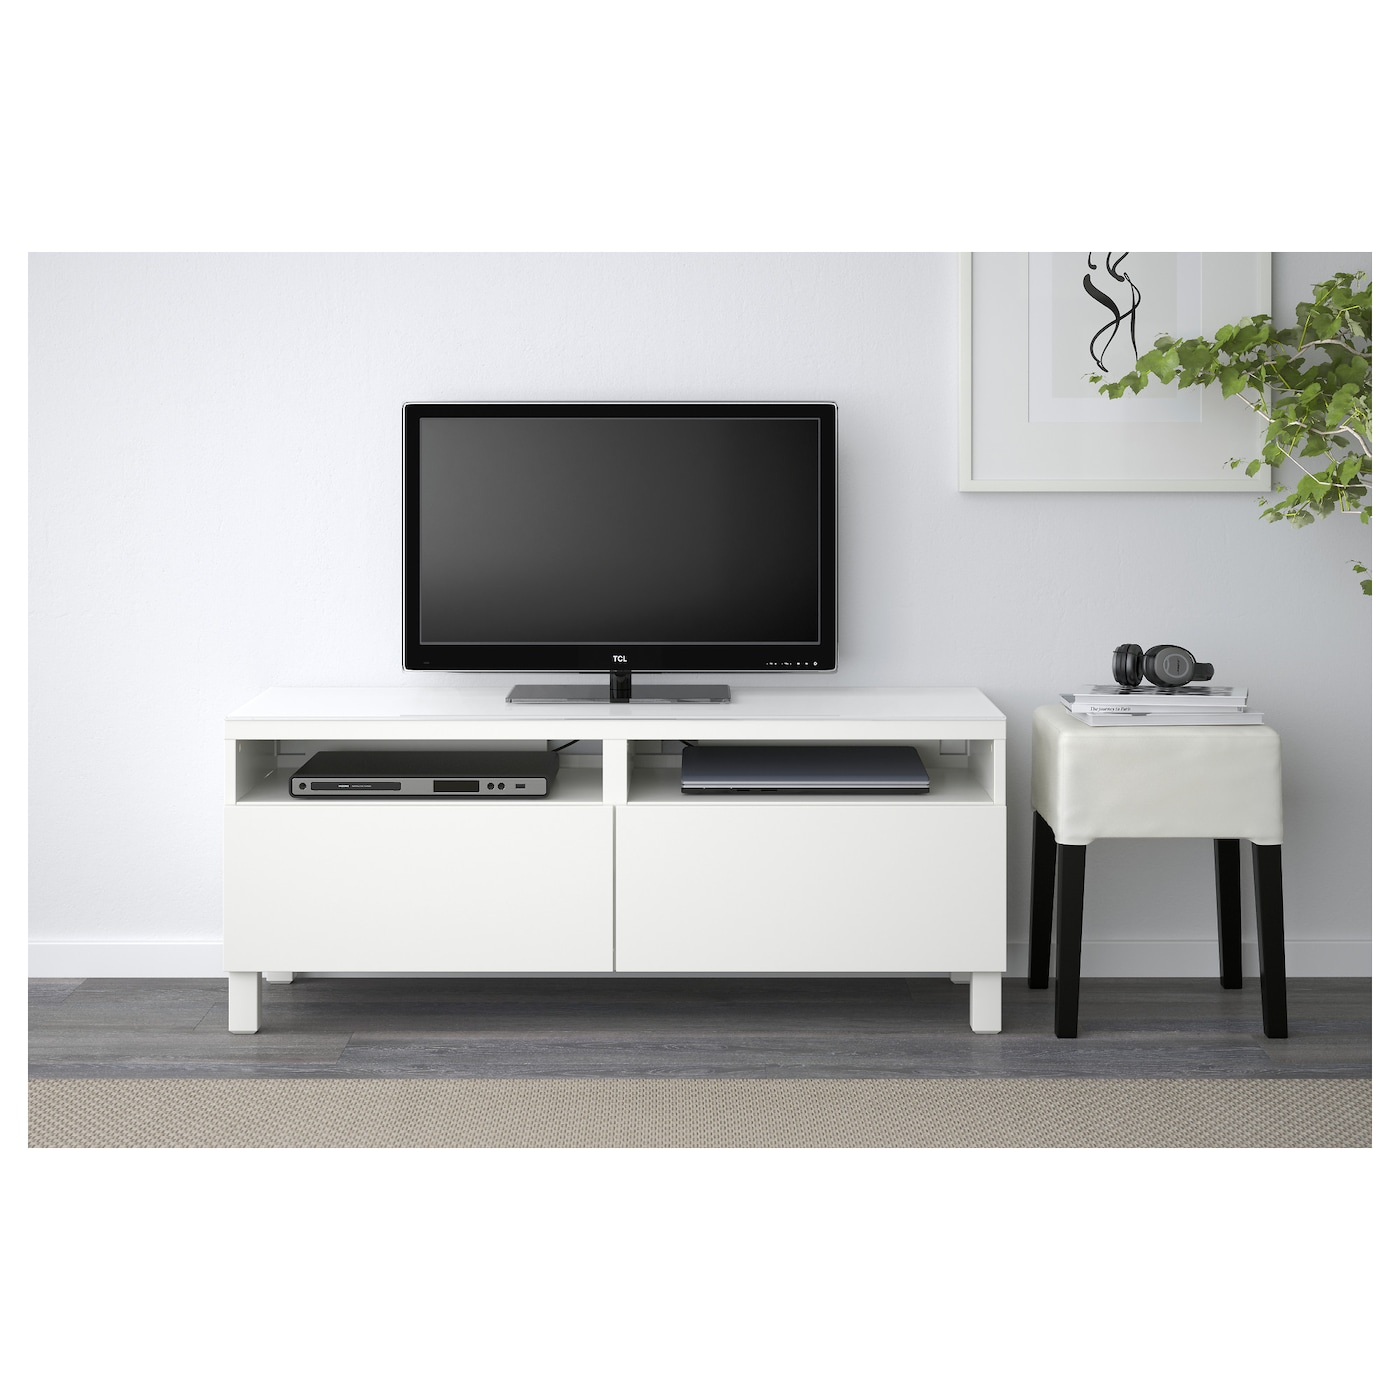 Besta Mueble Tv Con Almacenaje Lappviken Blanco 120 X 40 X 48 Cm Ikea